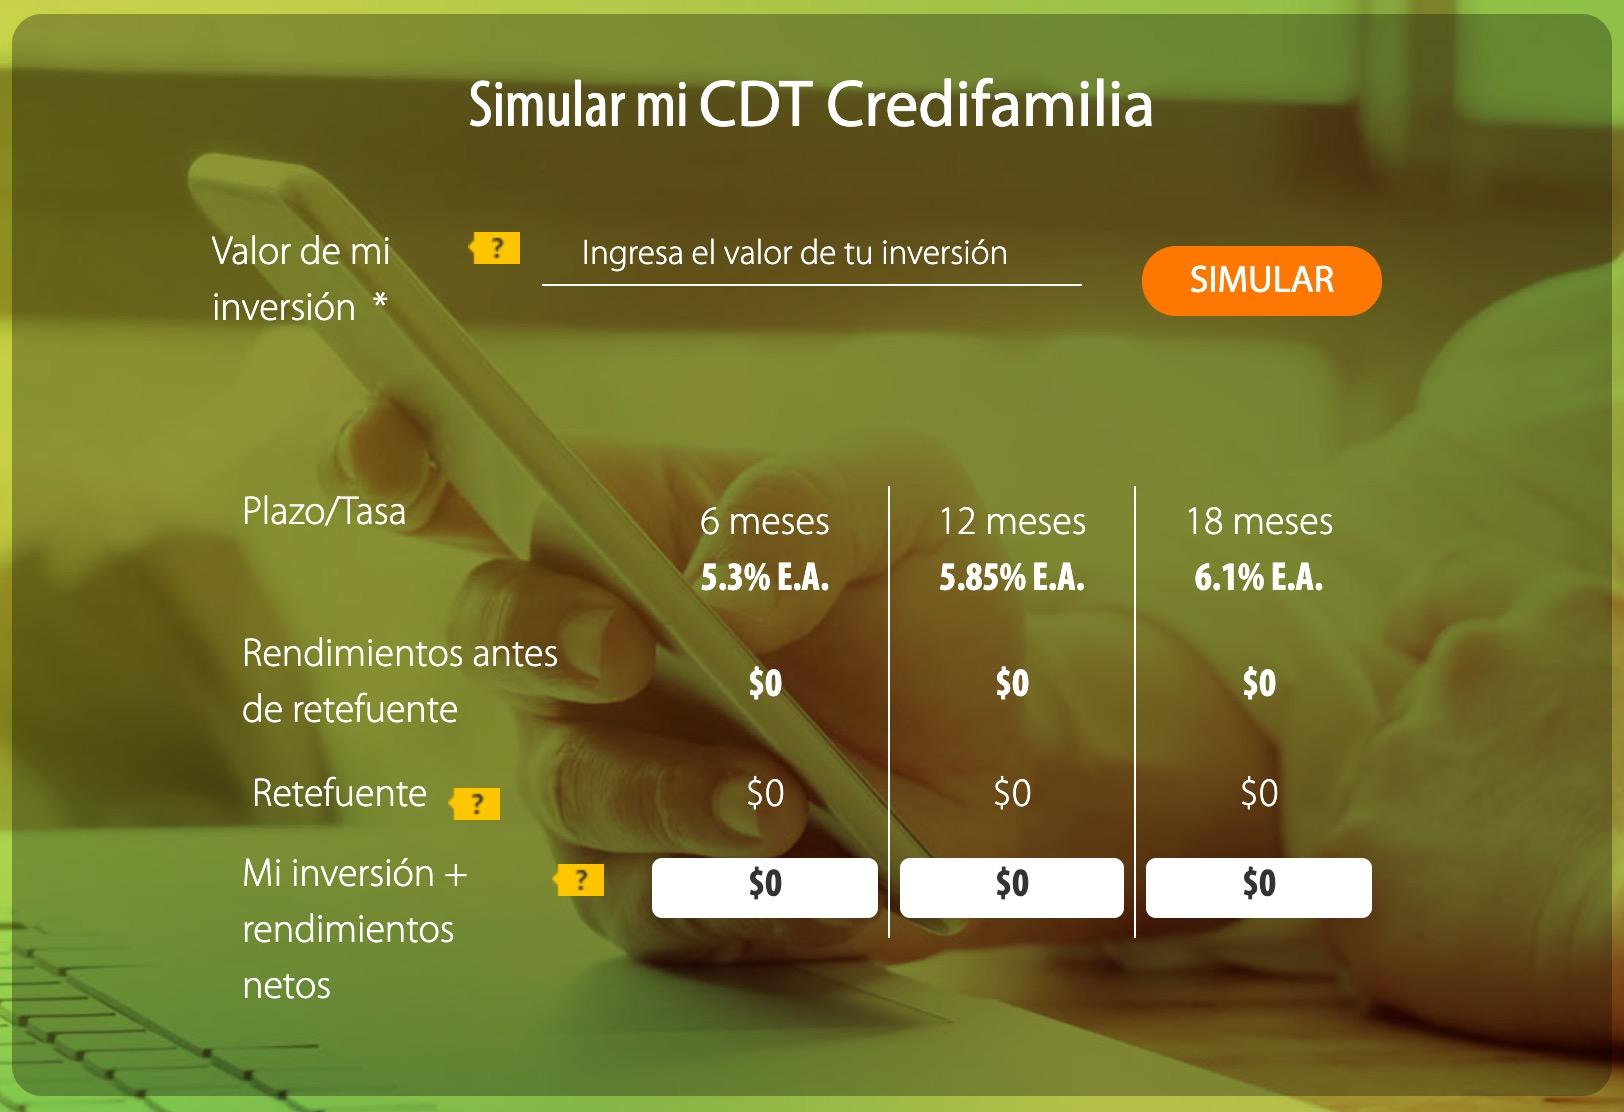 Simular CDT Credifamilia